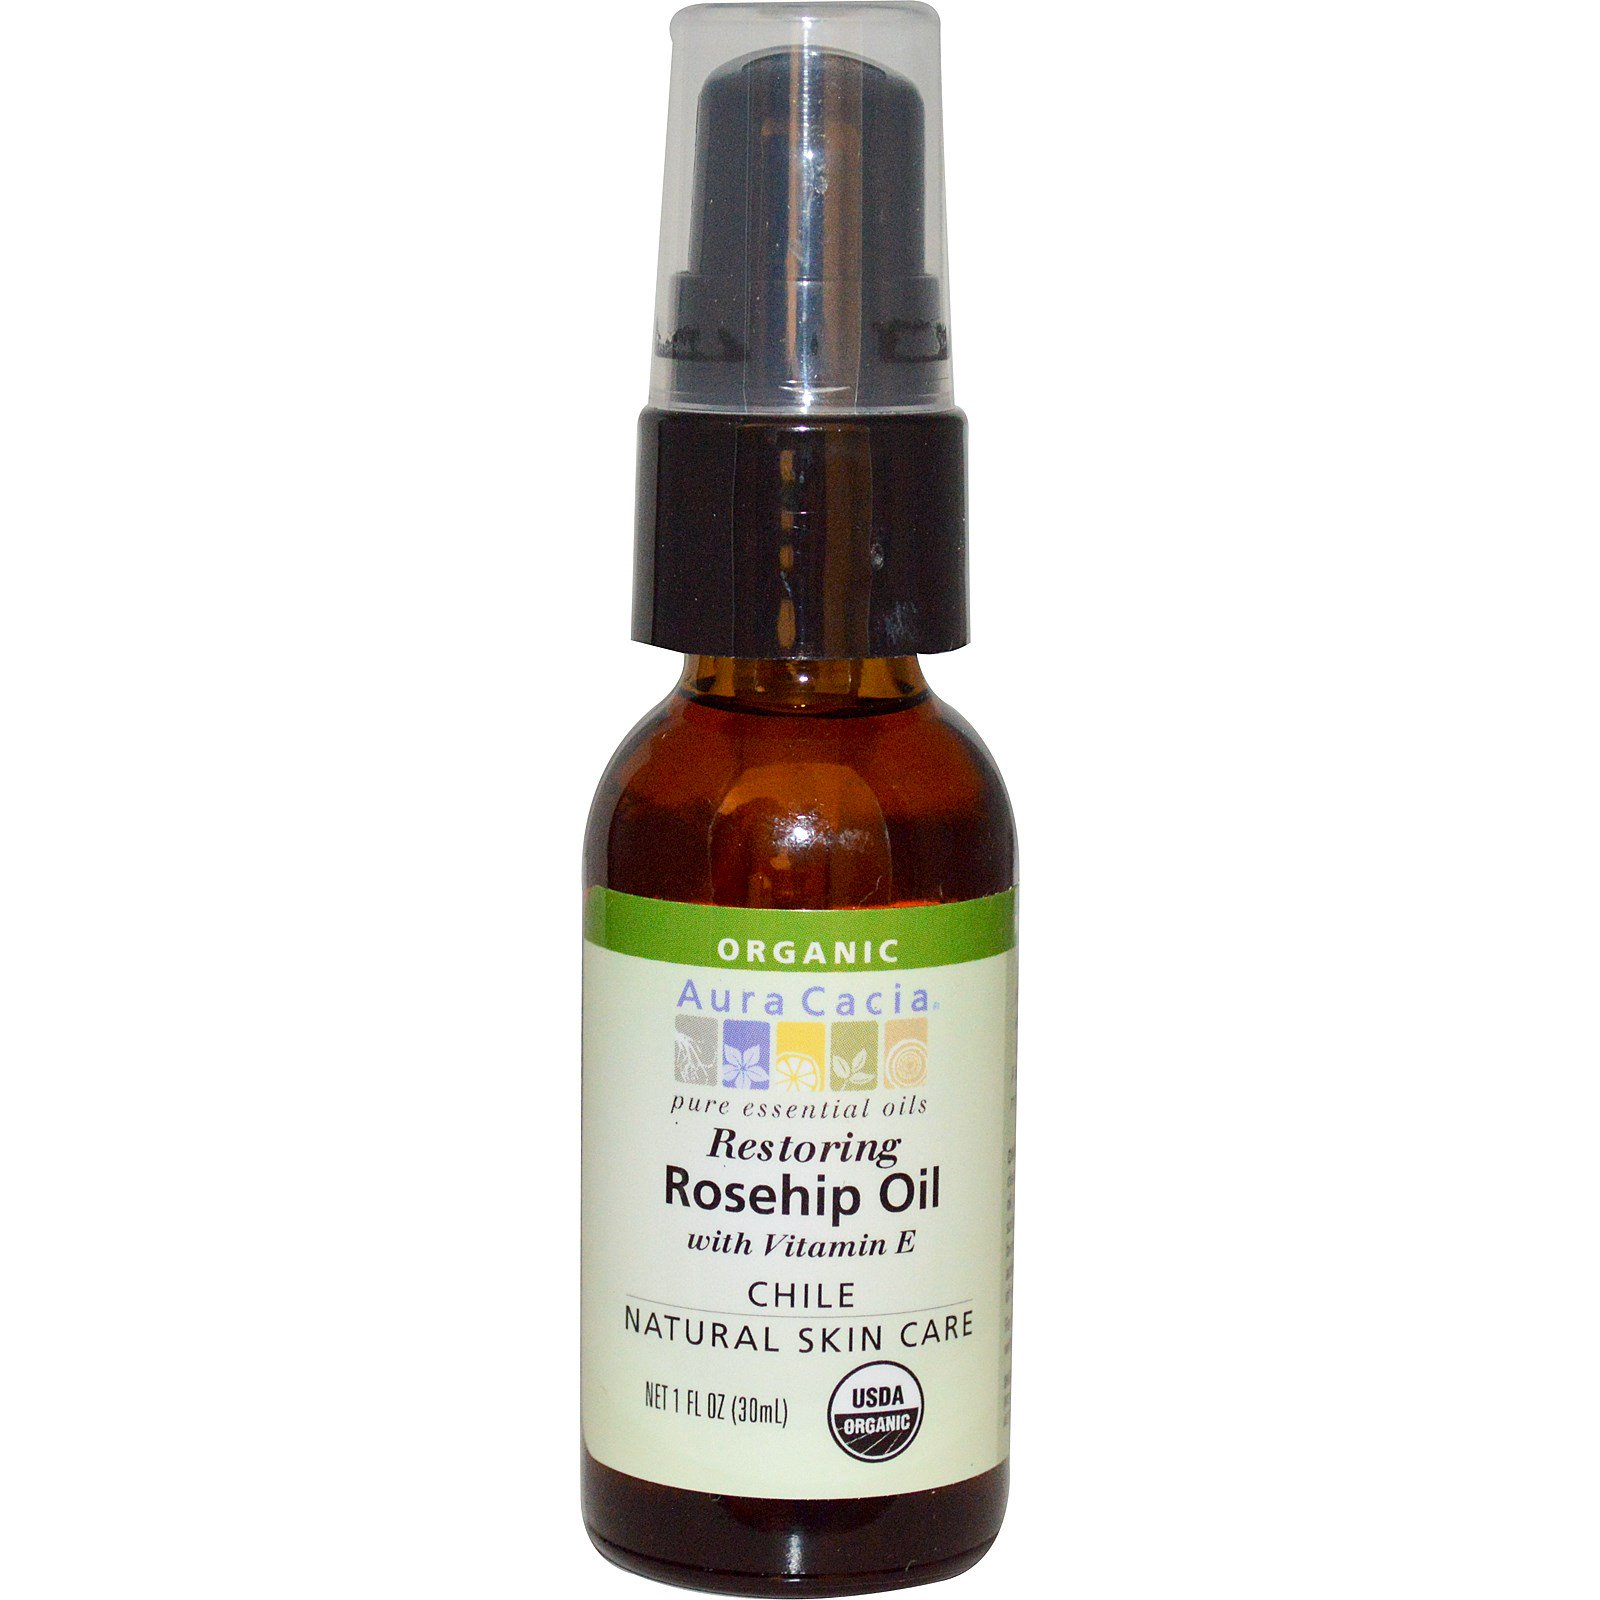 Aura Cacia, Organic, Rosehip Oil, Restoring, 1 Fl Oz (30